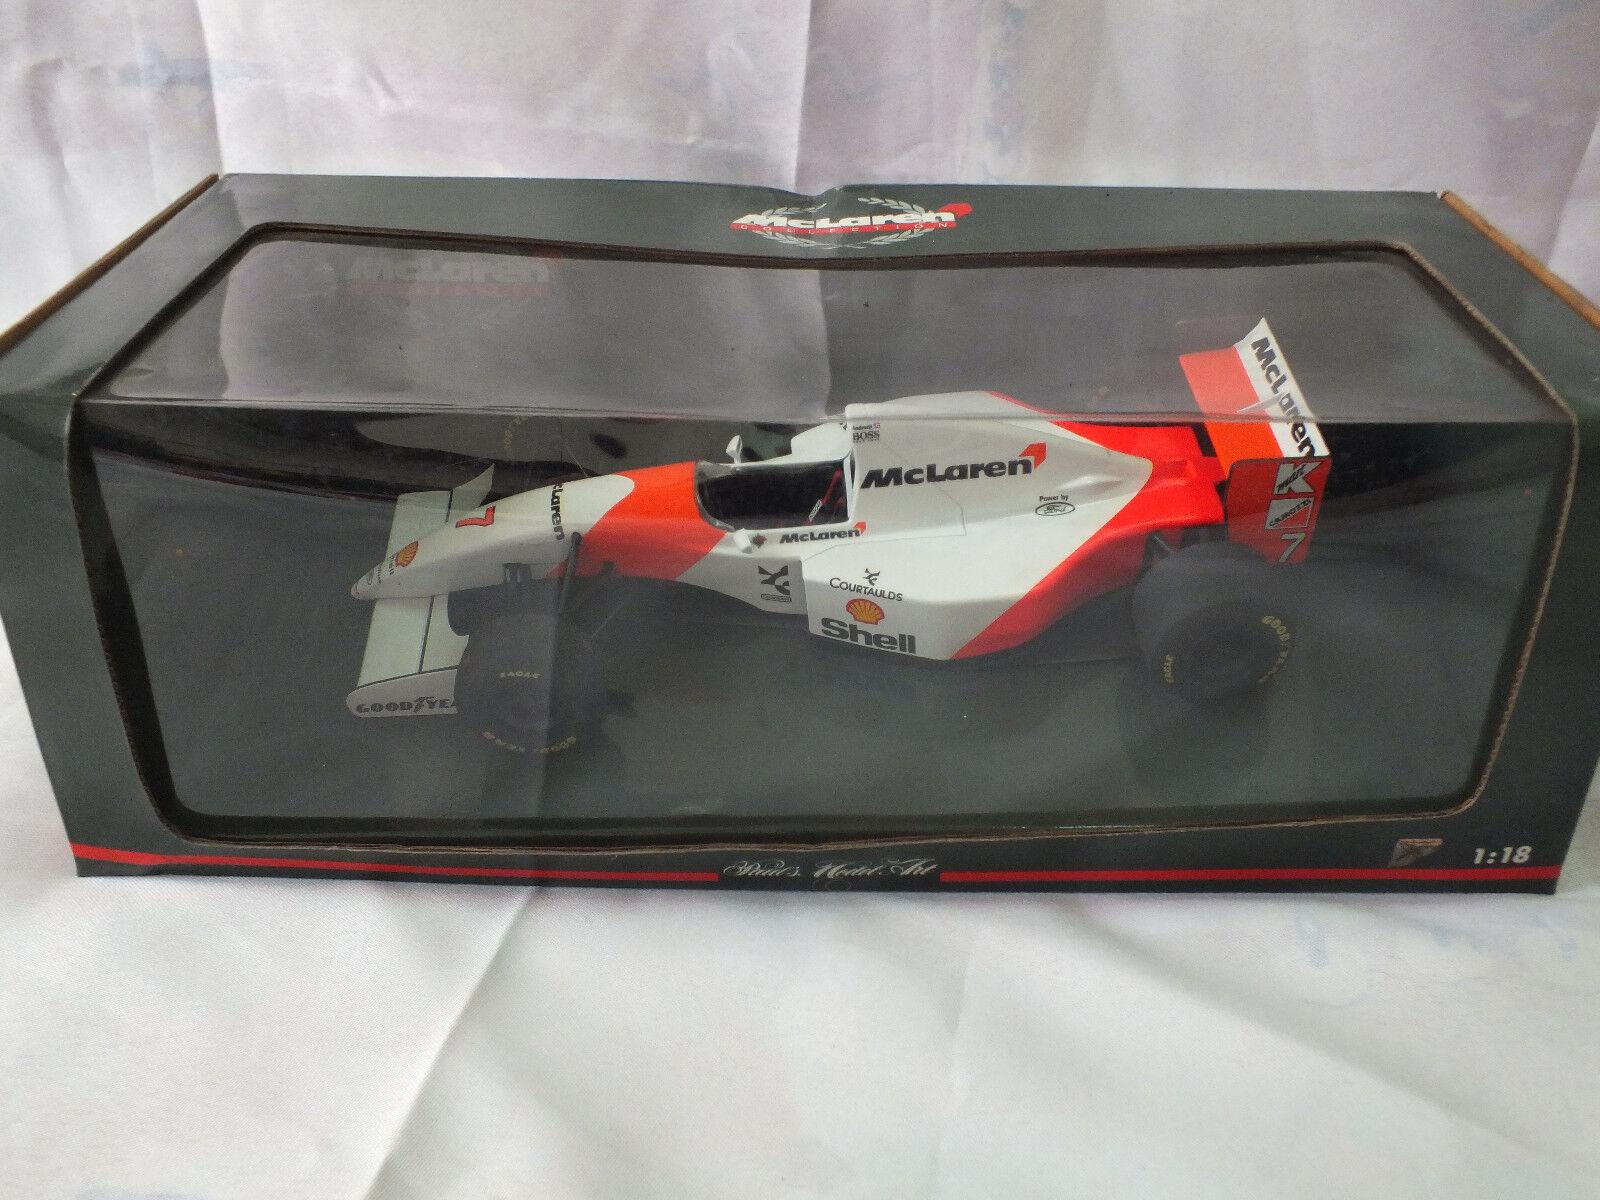 McLaren MP4/8 Andretti 1/18 Paul's Model Art - Minichamps